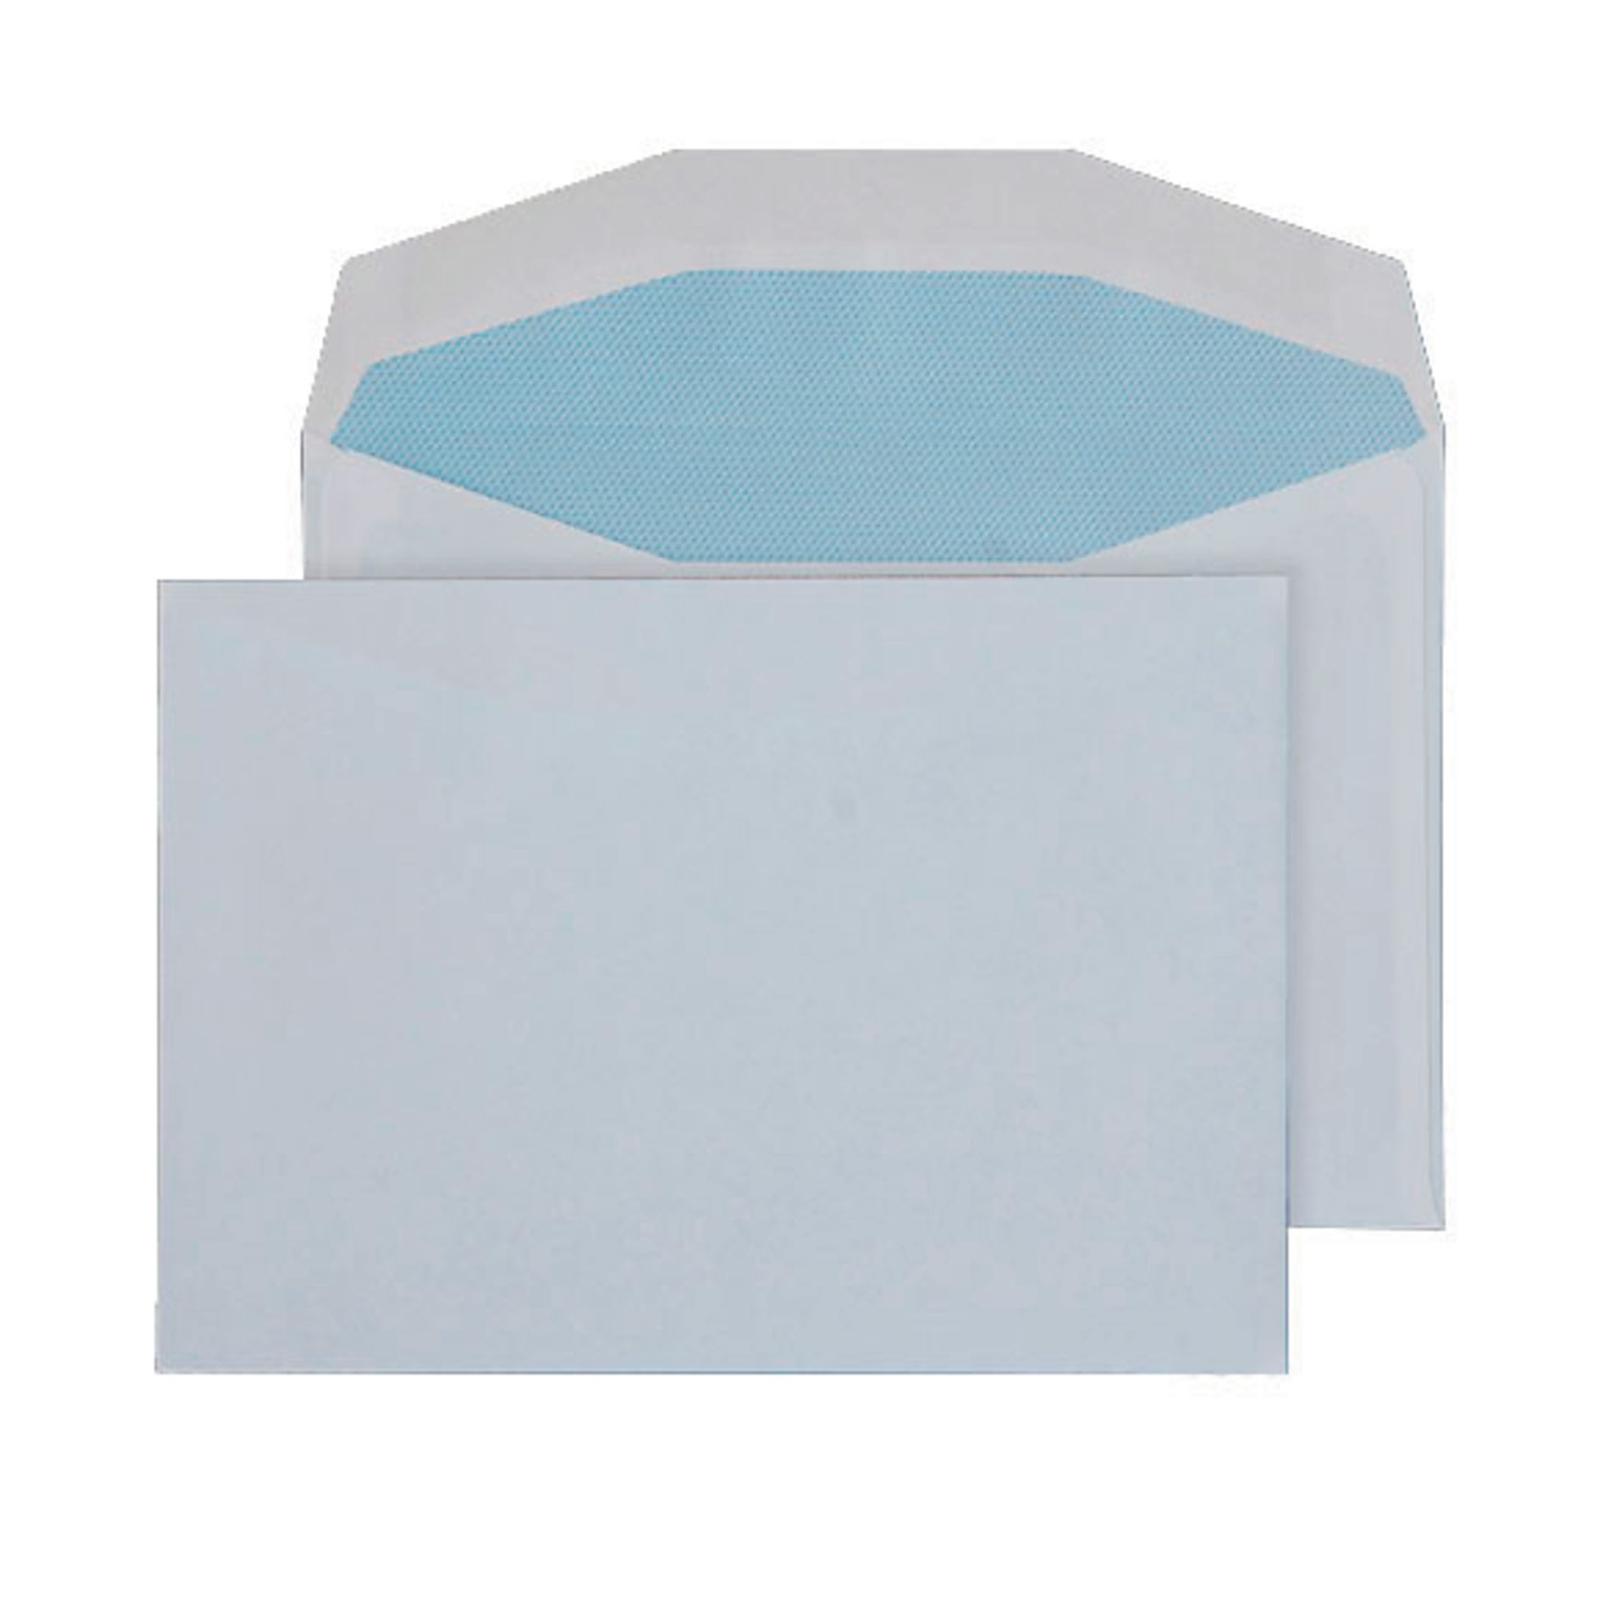 C6 White Self Seal Wallet Envelopes - Box of 1000